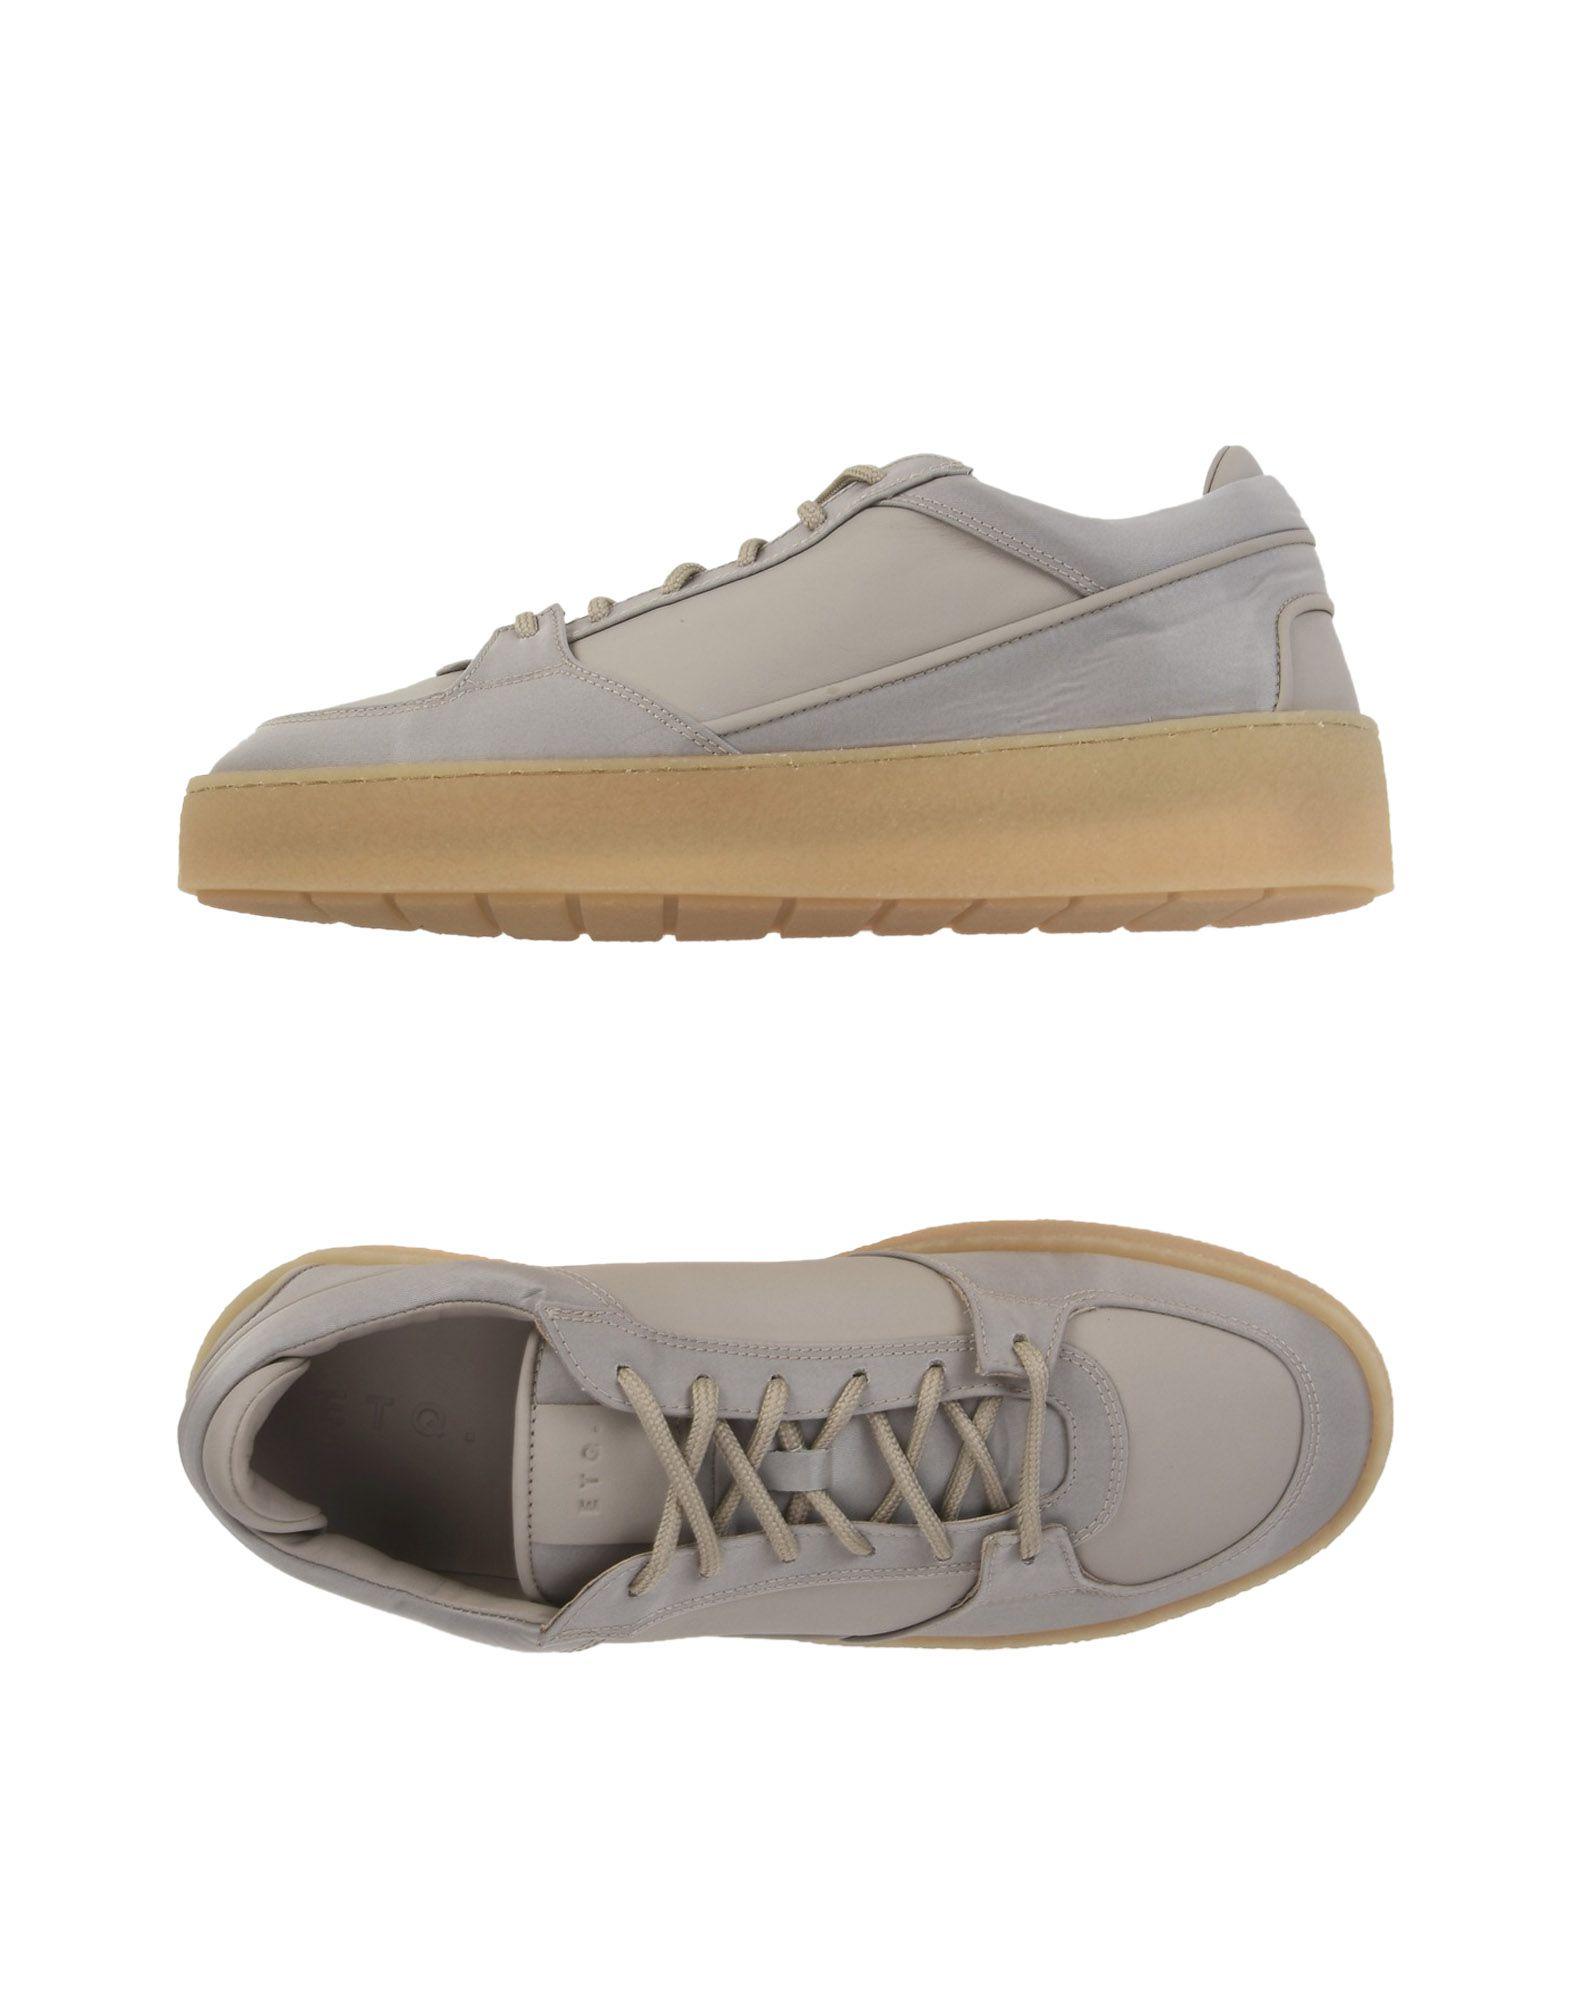 Etq Amsterdam Low 3  Schuhe 11470722WA Gute Qualität beliebte Schuhe  cd9e09